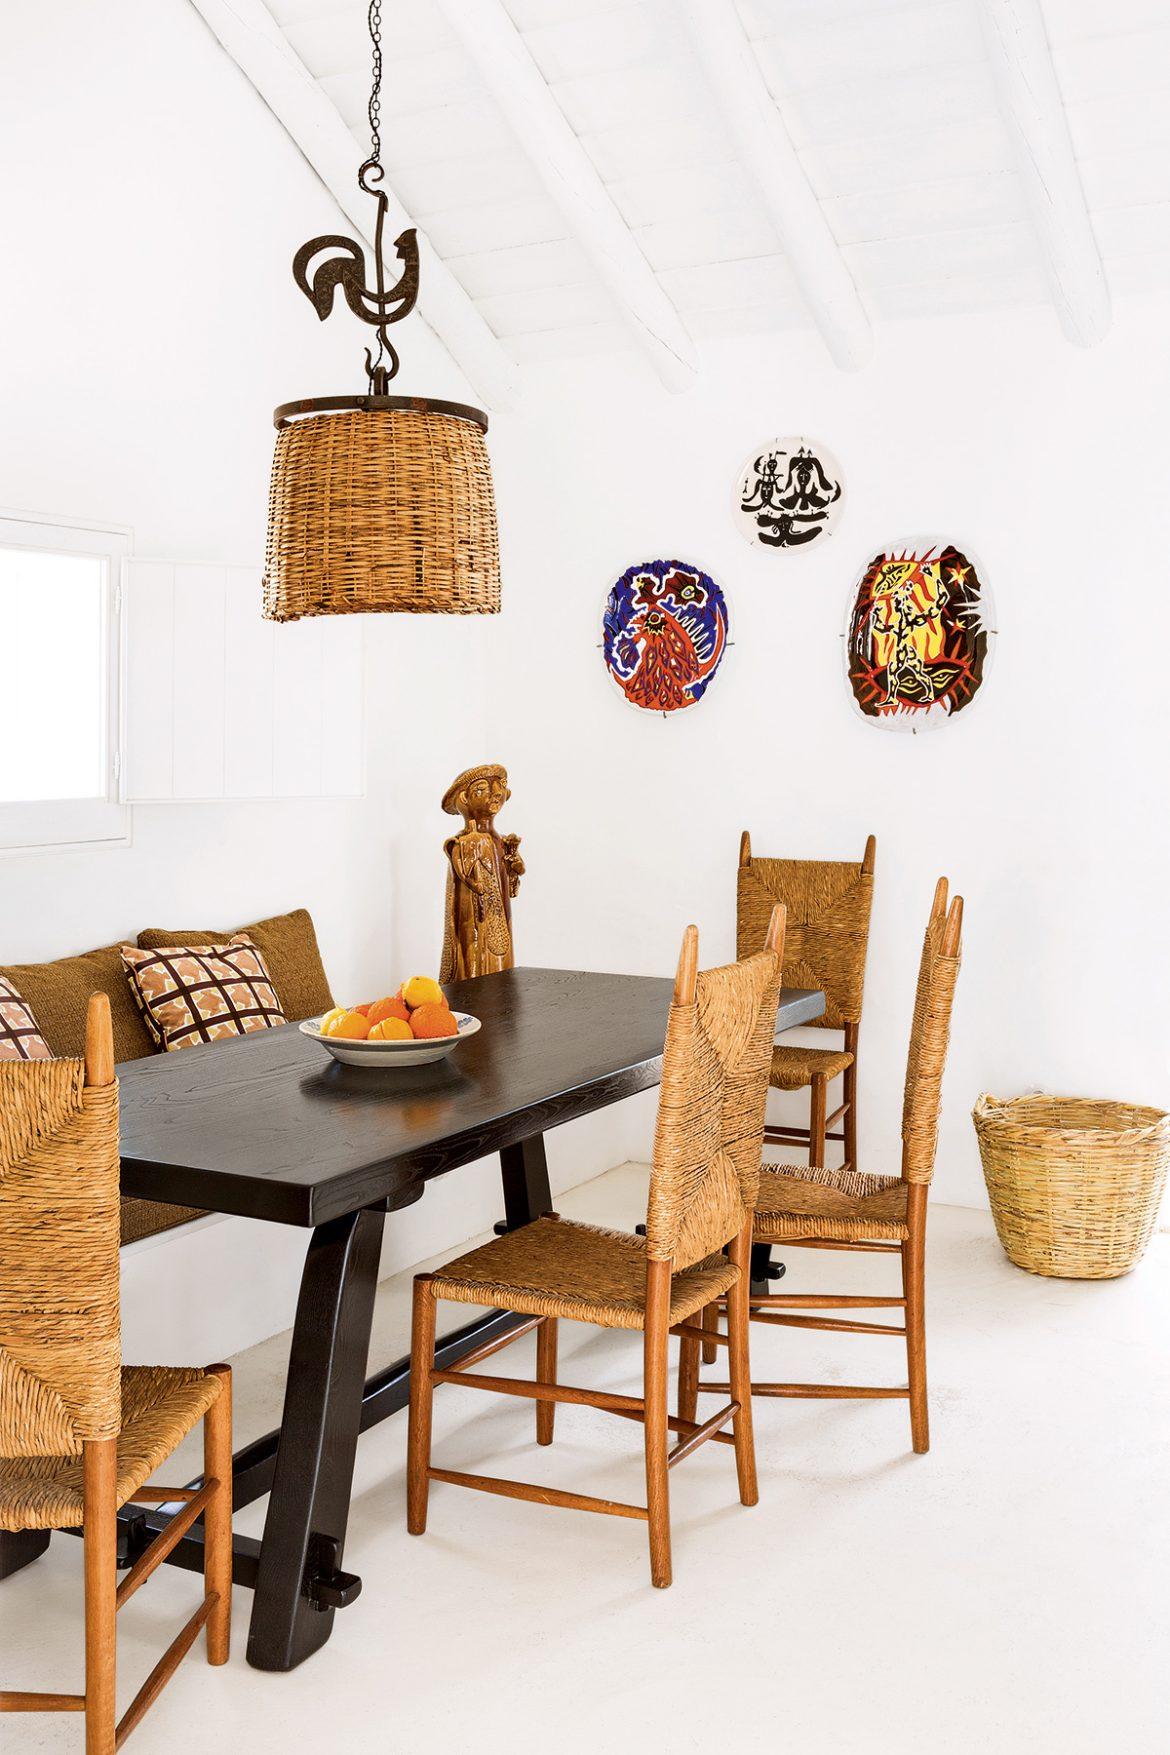 esprit boh me archives turbulences d co. Black Bedroom Furniture Sets. Home Design Ideas